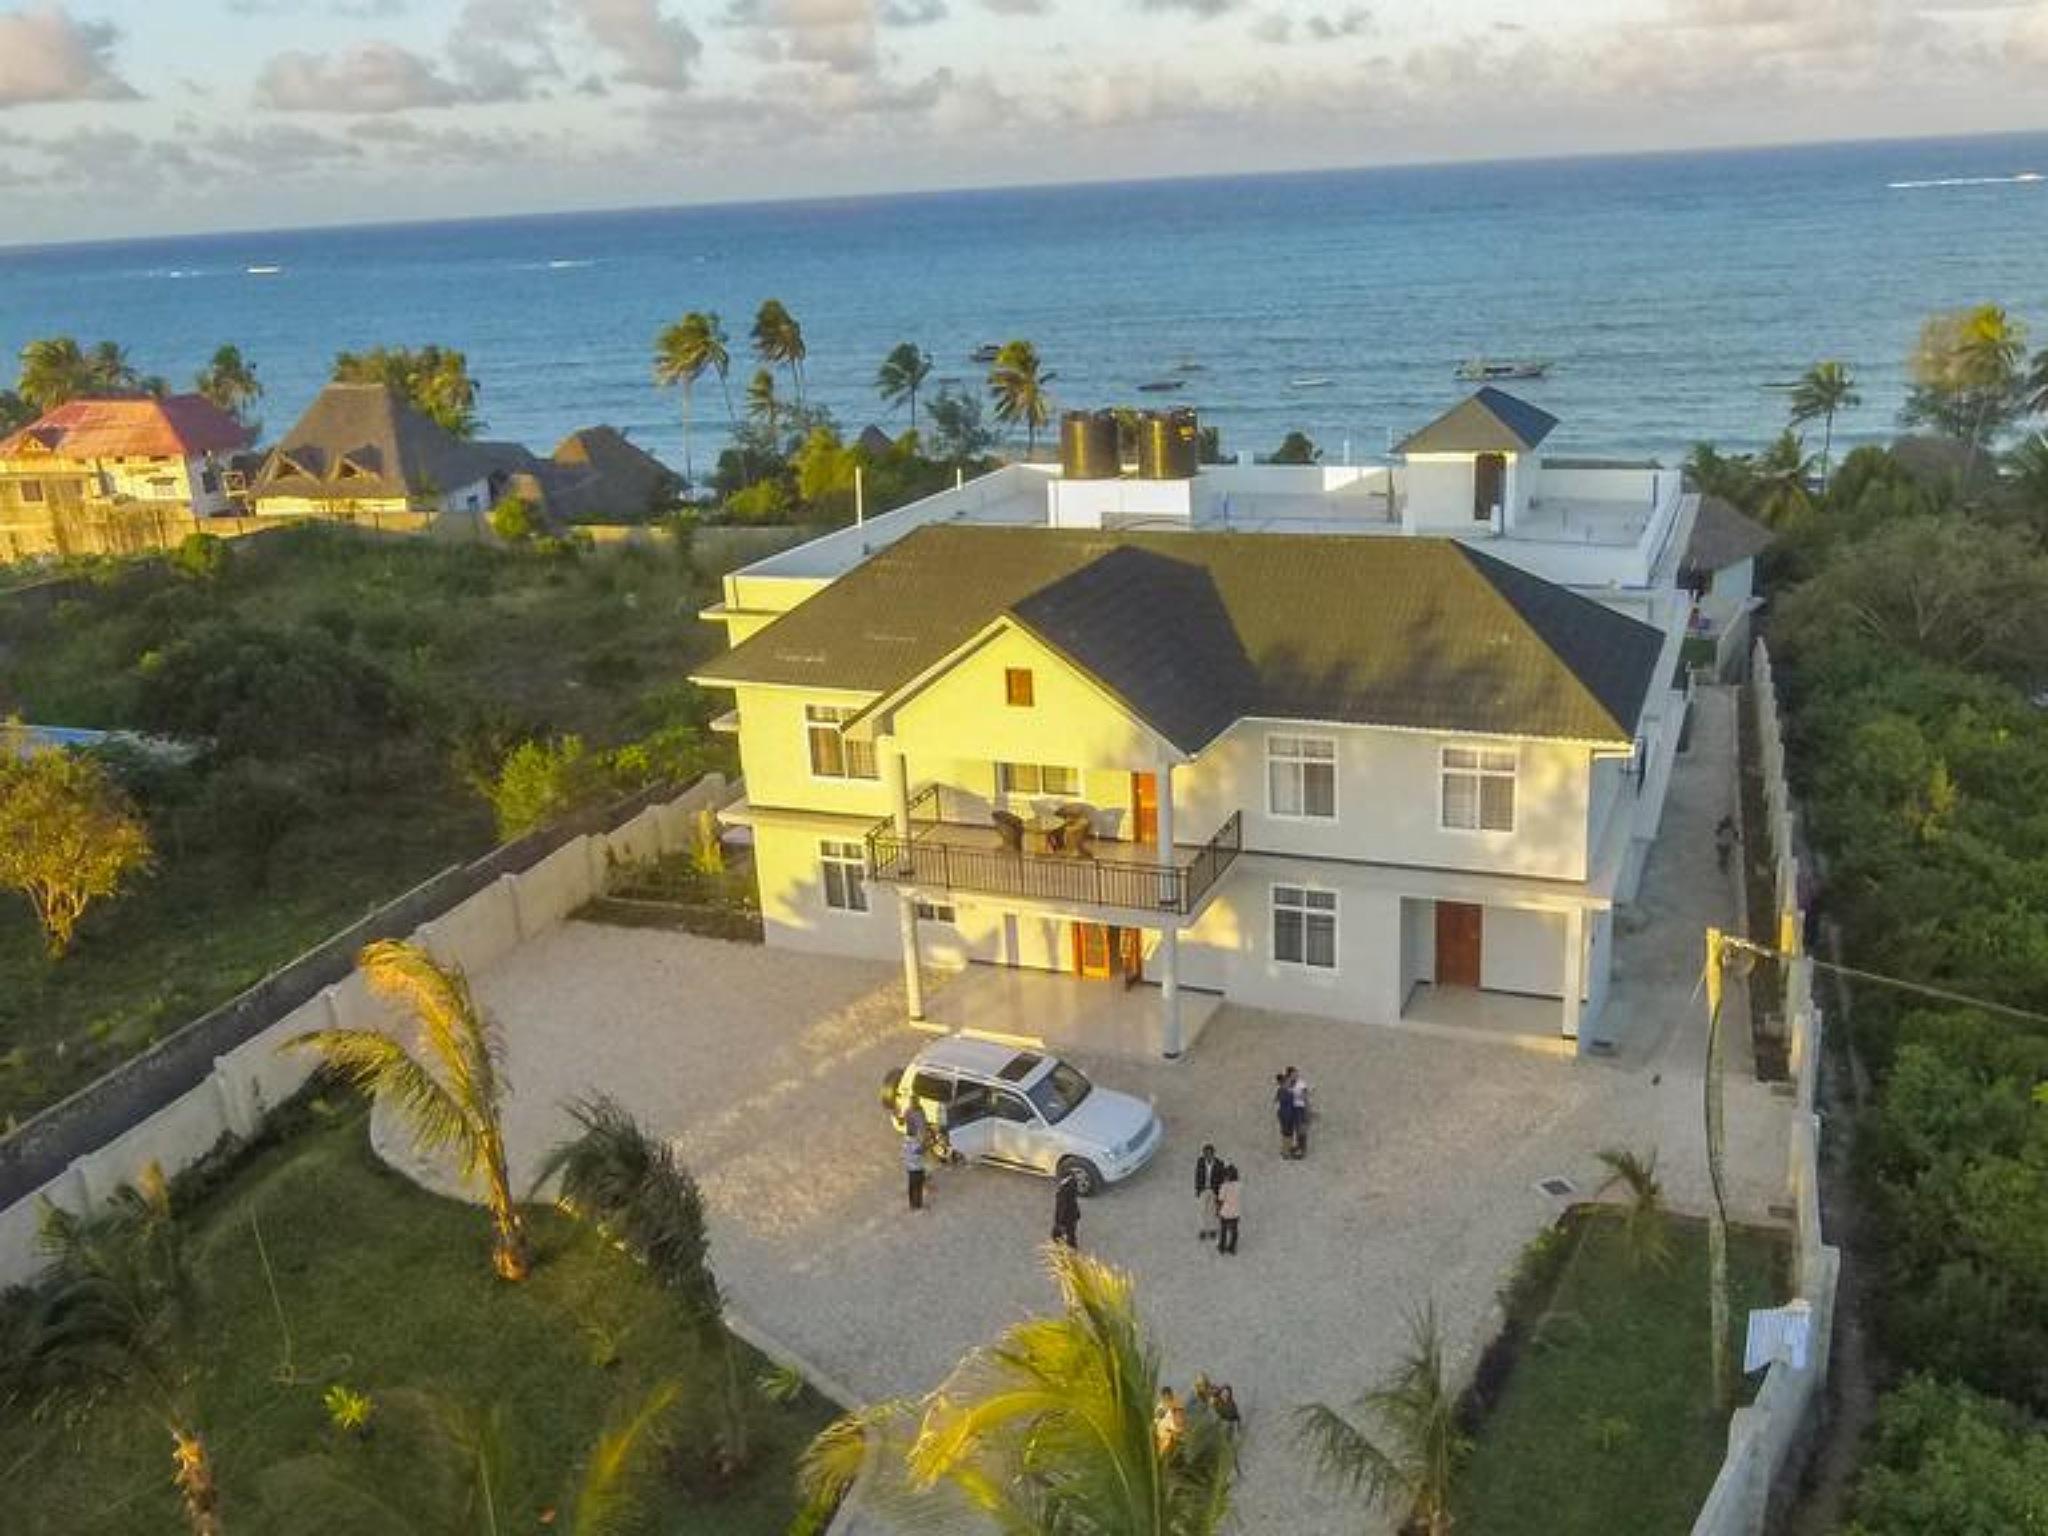 Das Sea Crest Hotel Spa befindet sich in Strandnah  in Tansania